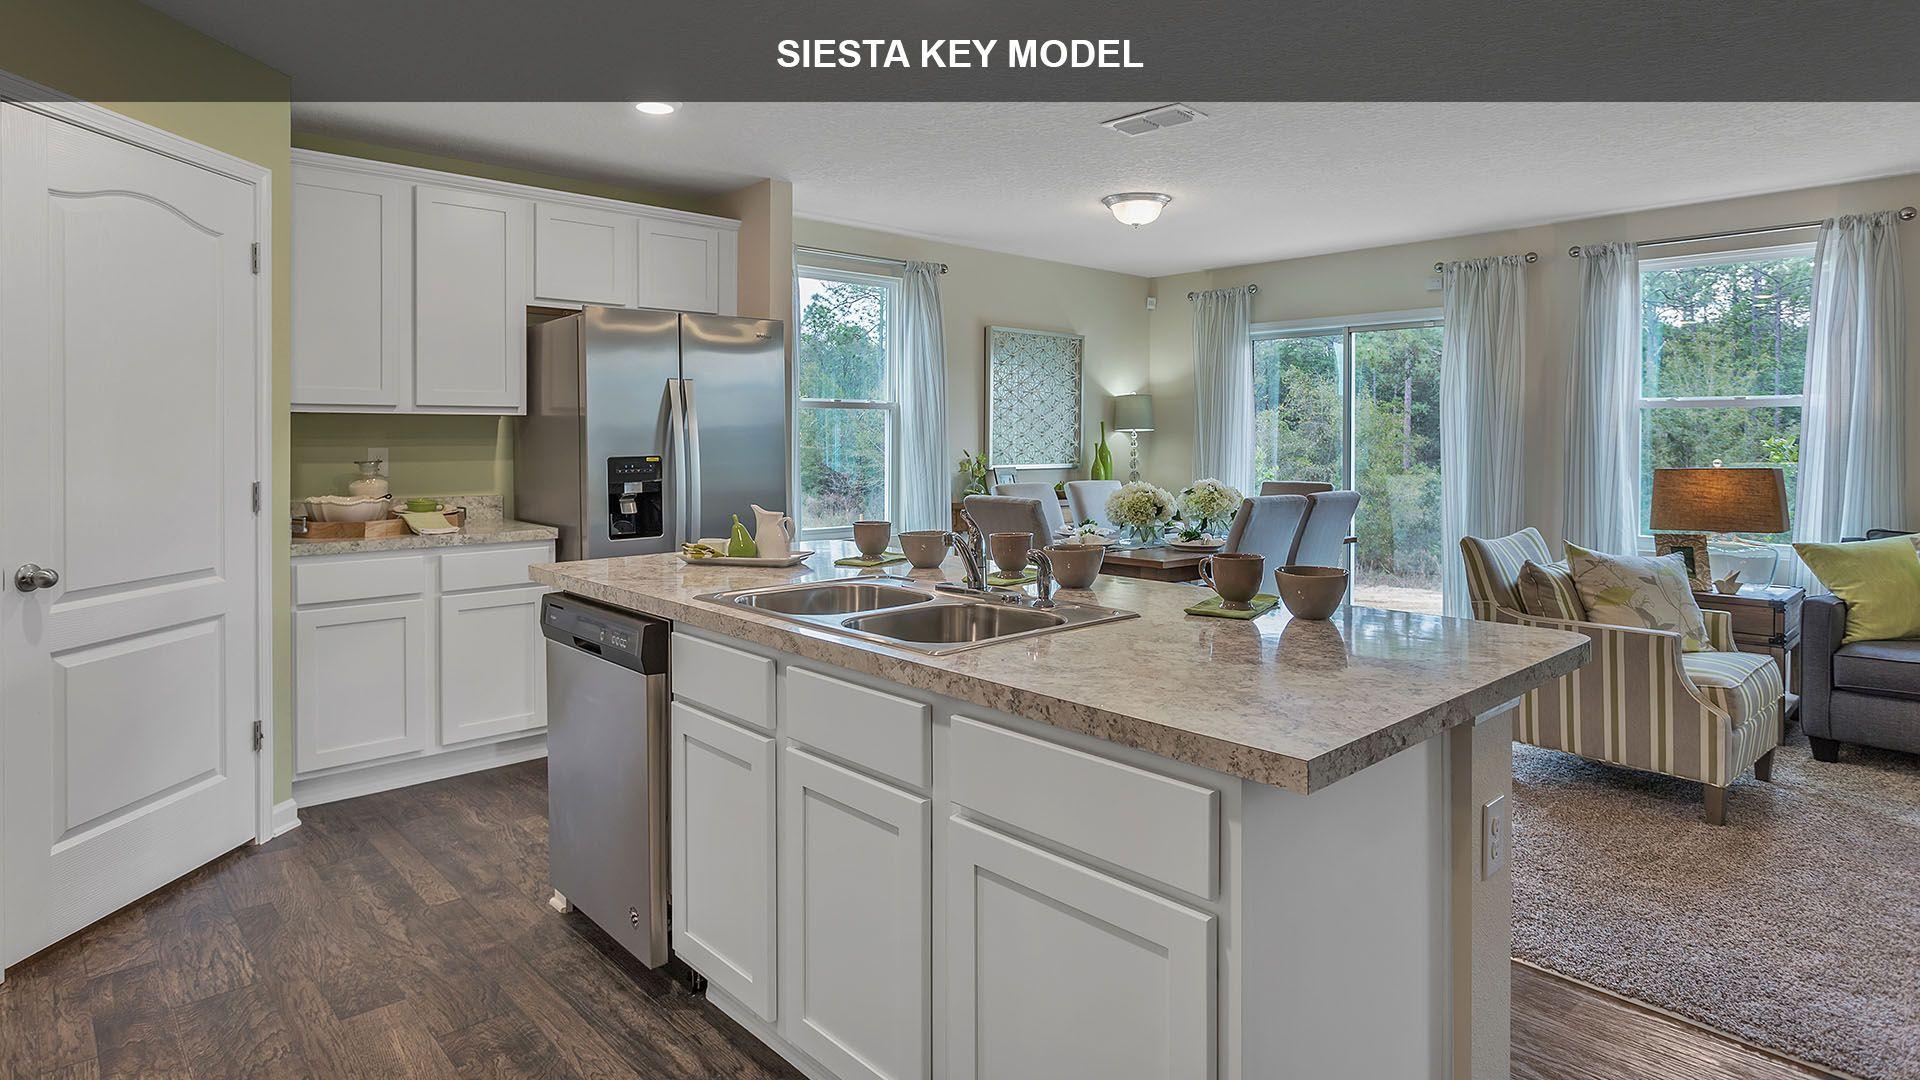 Kitchen featured in the SIESTA KEY By D.R. Horton in Jacksonville-St. Augustine, FL